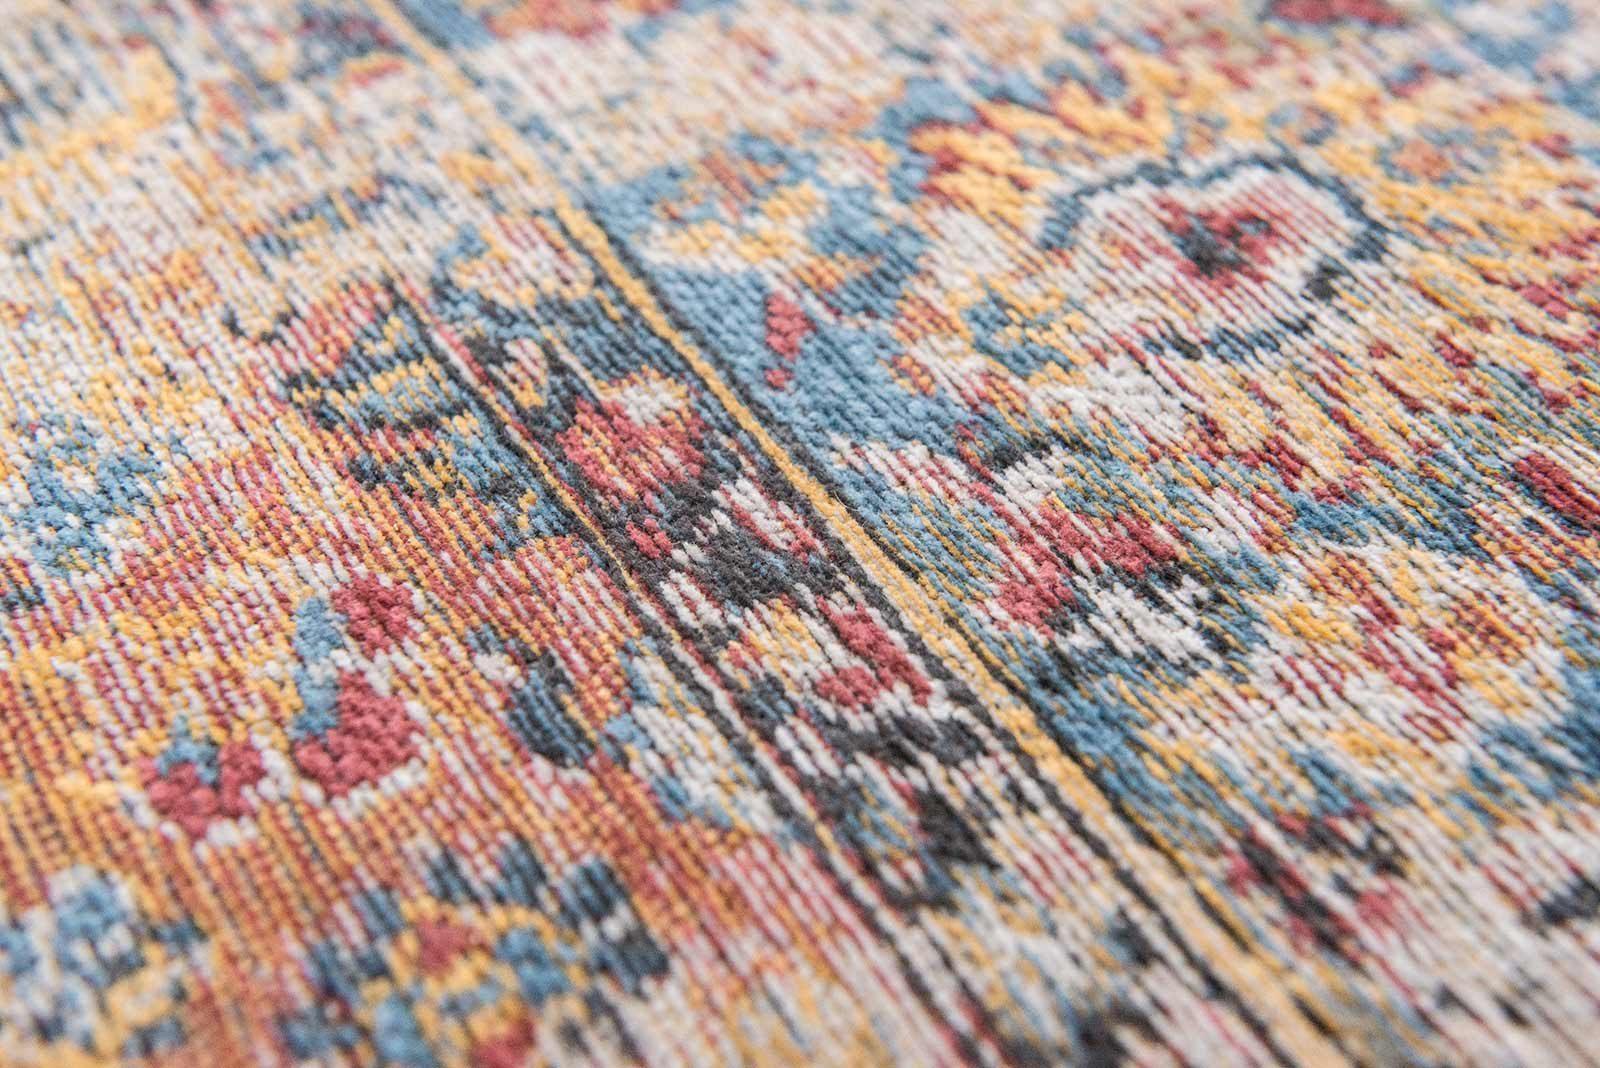 rugs Louis De Poortere LX8713 Antiquarian Antique Bakthiari Khedive Multi zoom